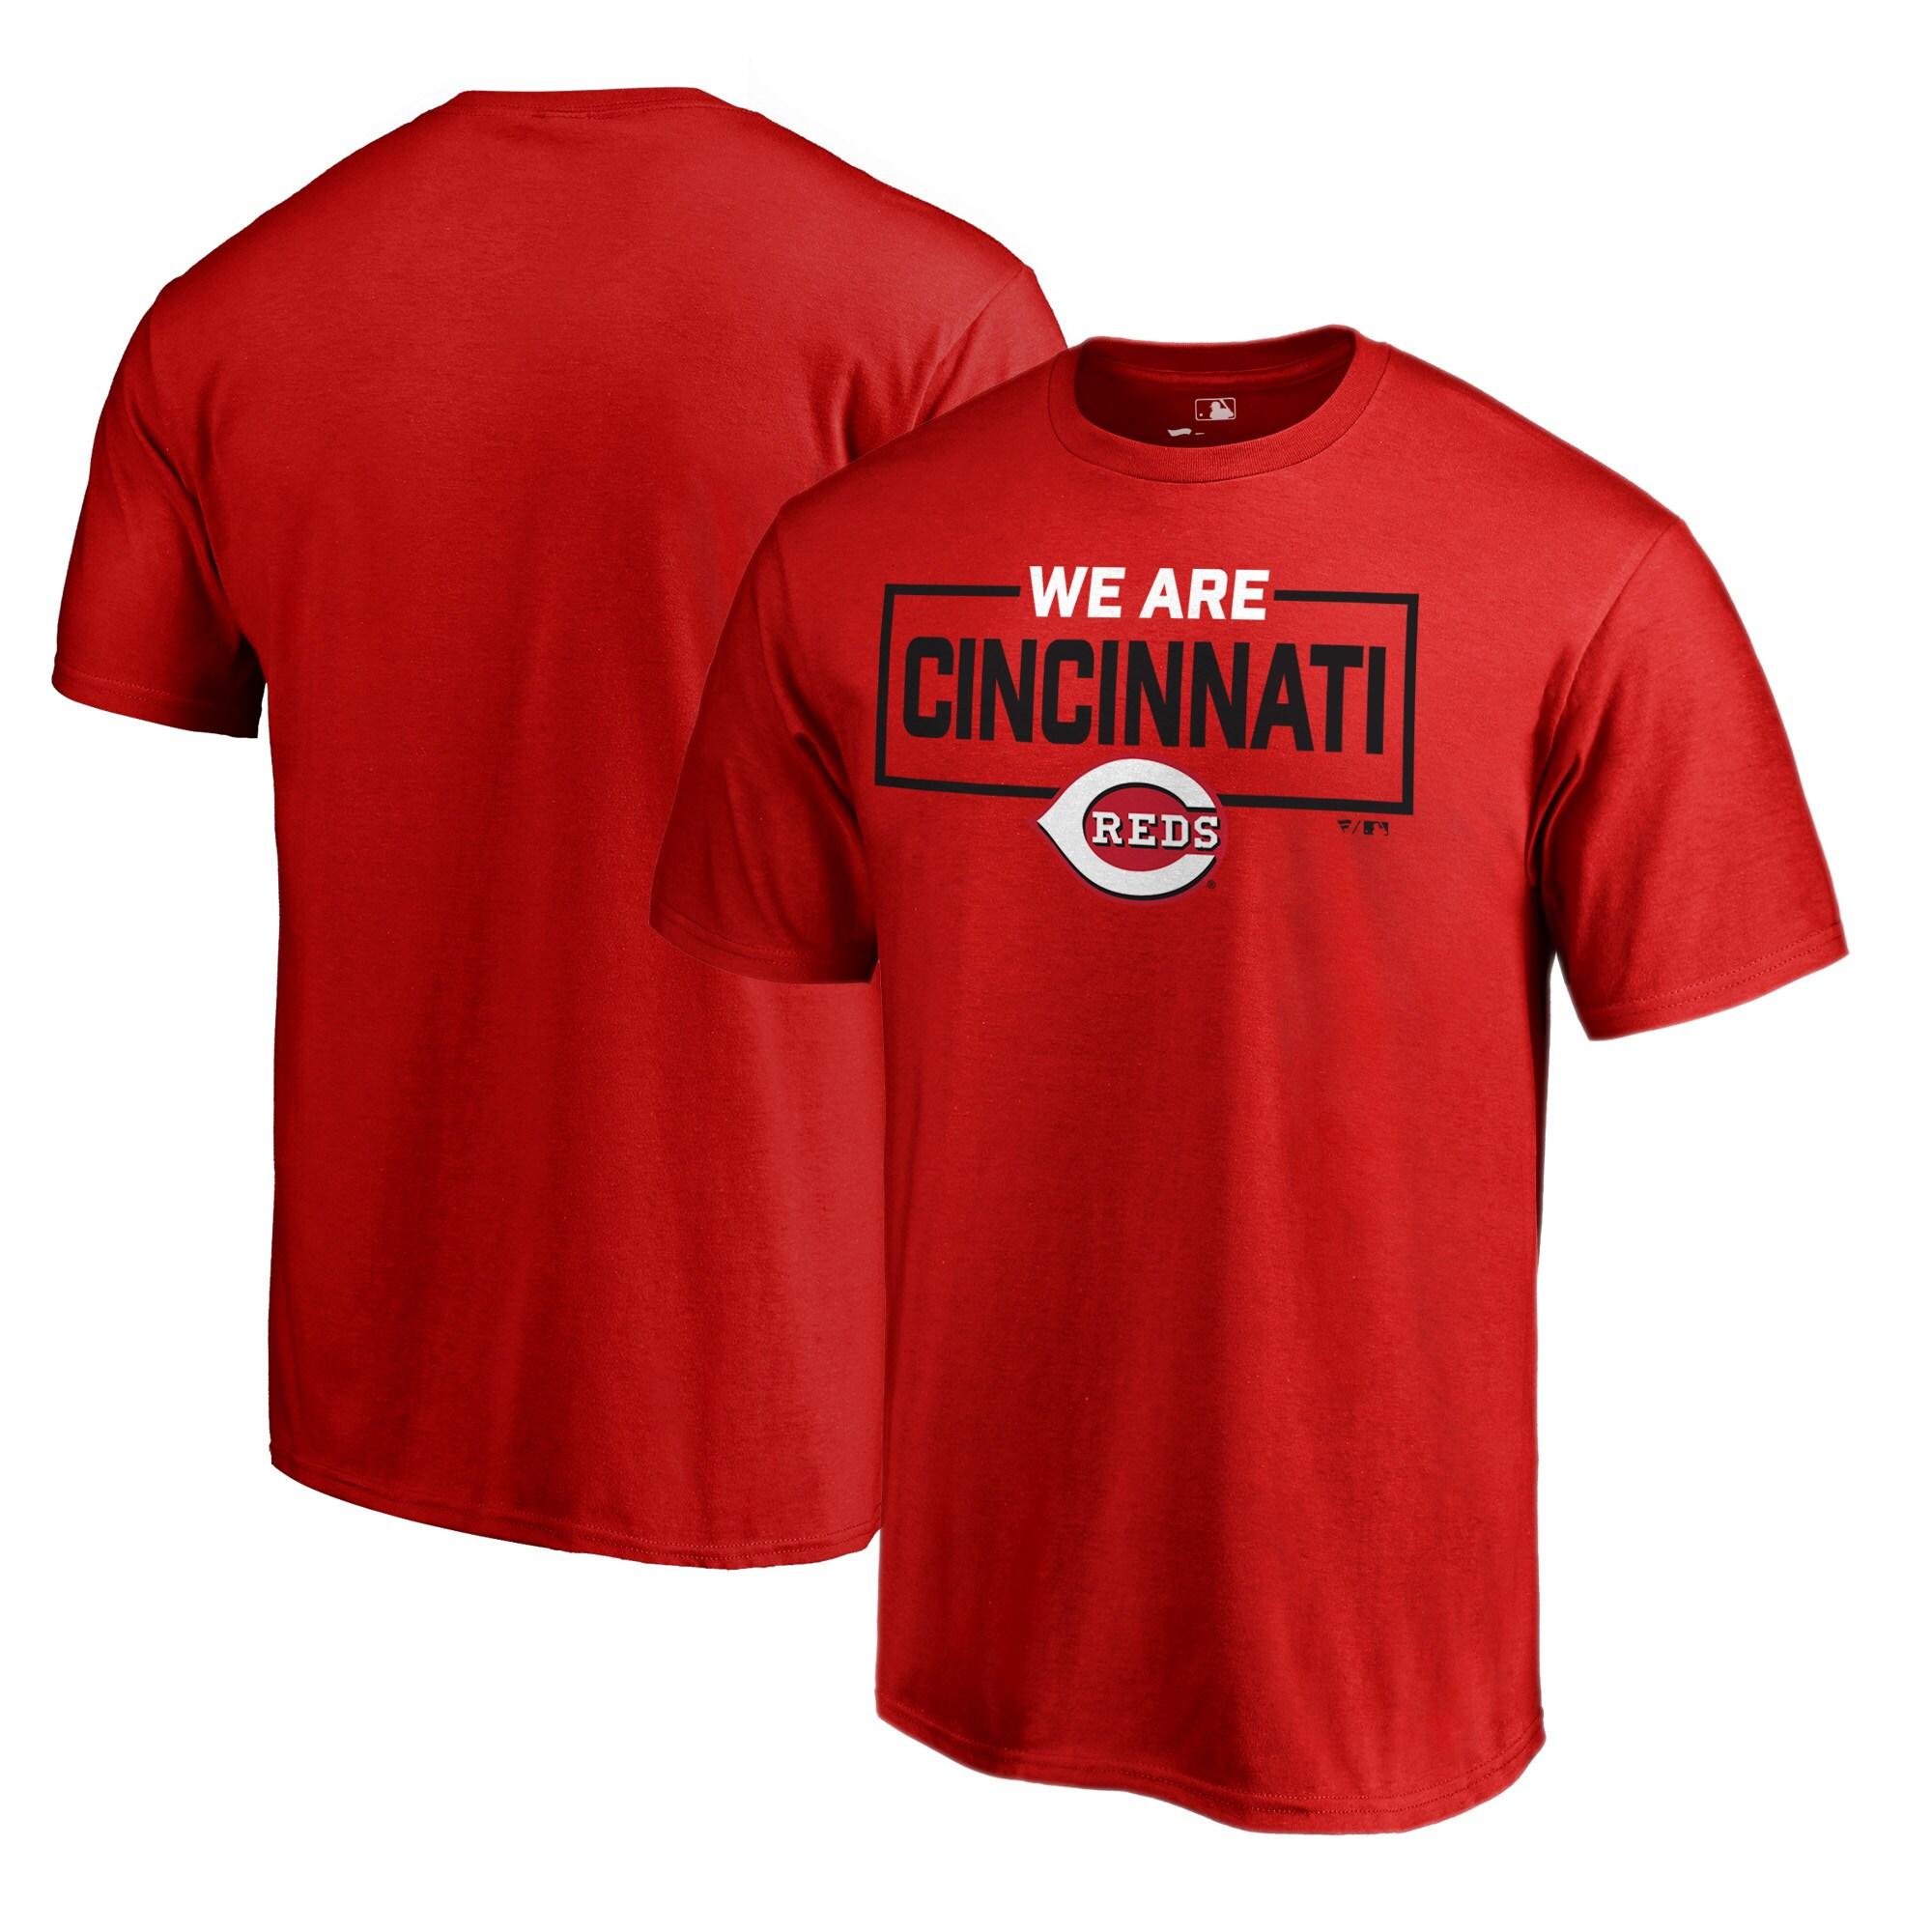 Cincinnati Reds Fanatics Branded We Are Icon T-Shirt - Red